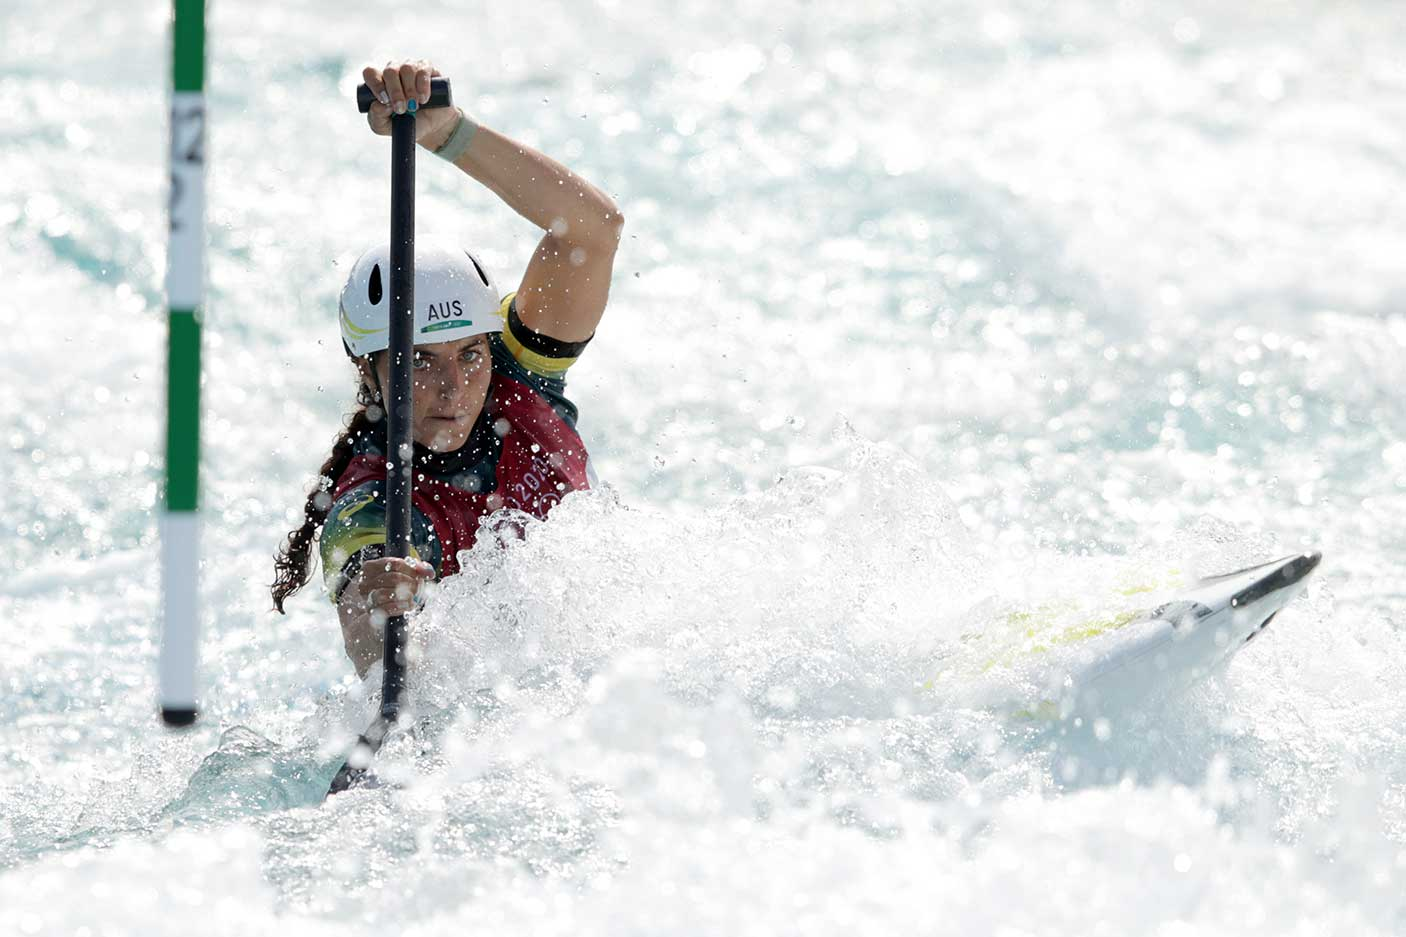 Jessica Fox of Team Australia competes during the Women's Canoe Slalom Semi-final